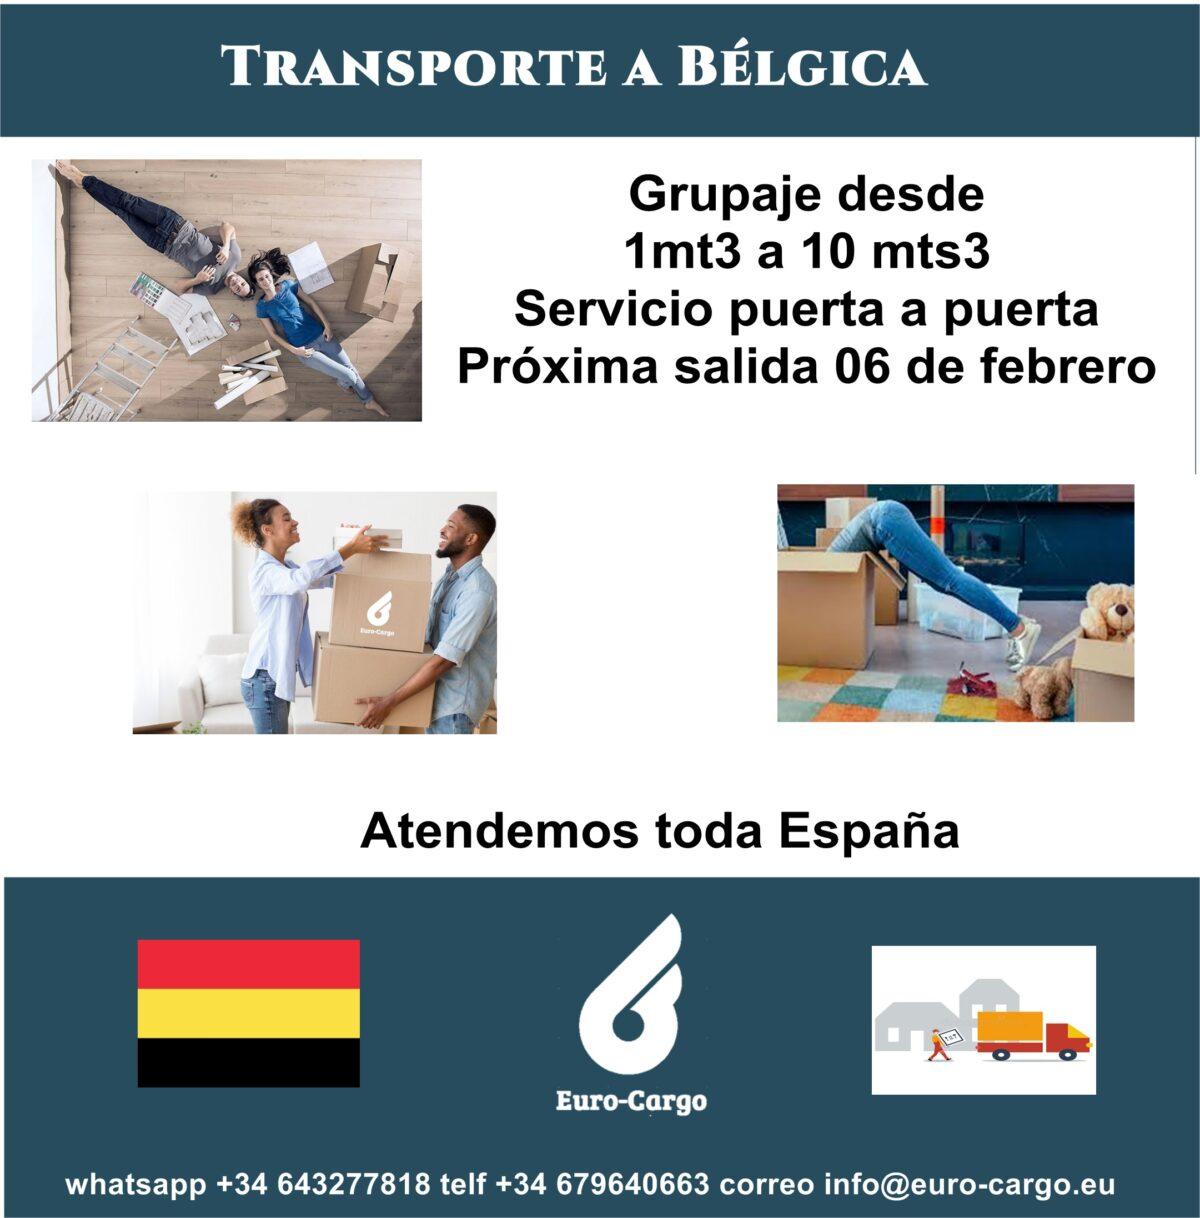 Mudanzas-a-Belgica-Grupajes-1200x1218.jpg